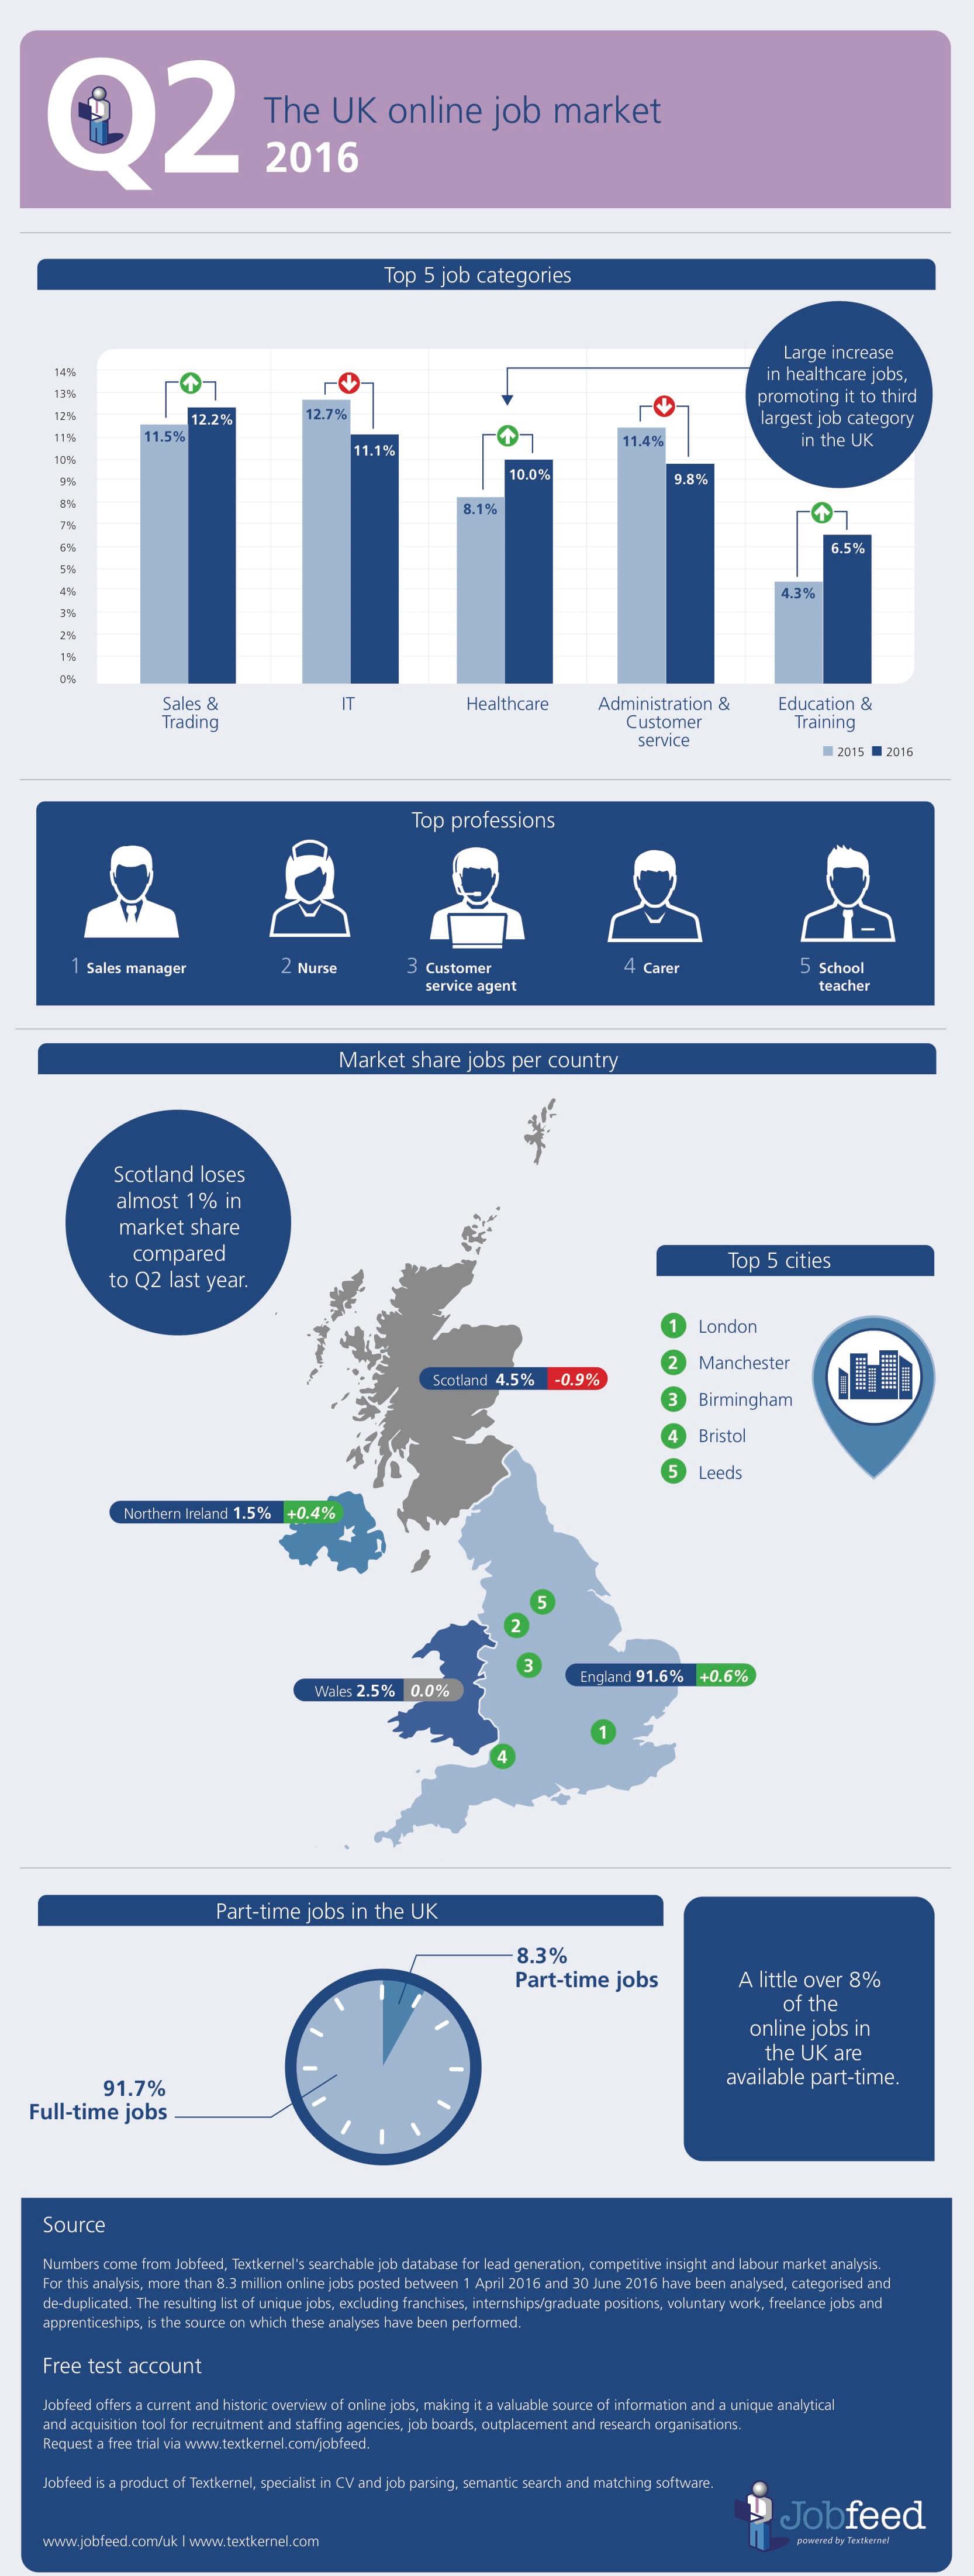 The UK job market in Q2 2016 -Jobfeed